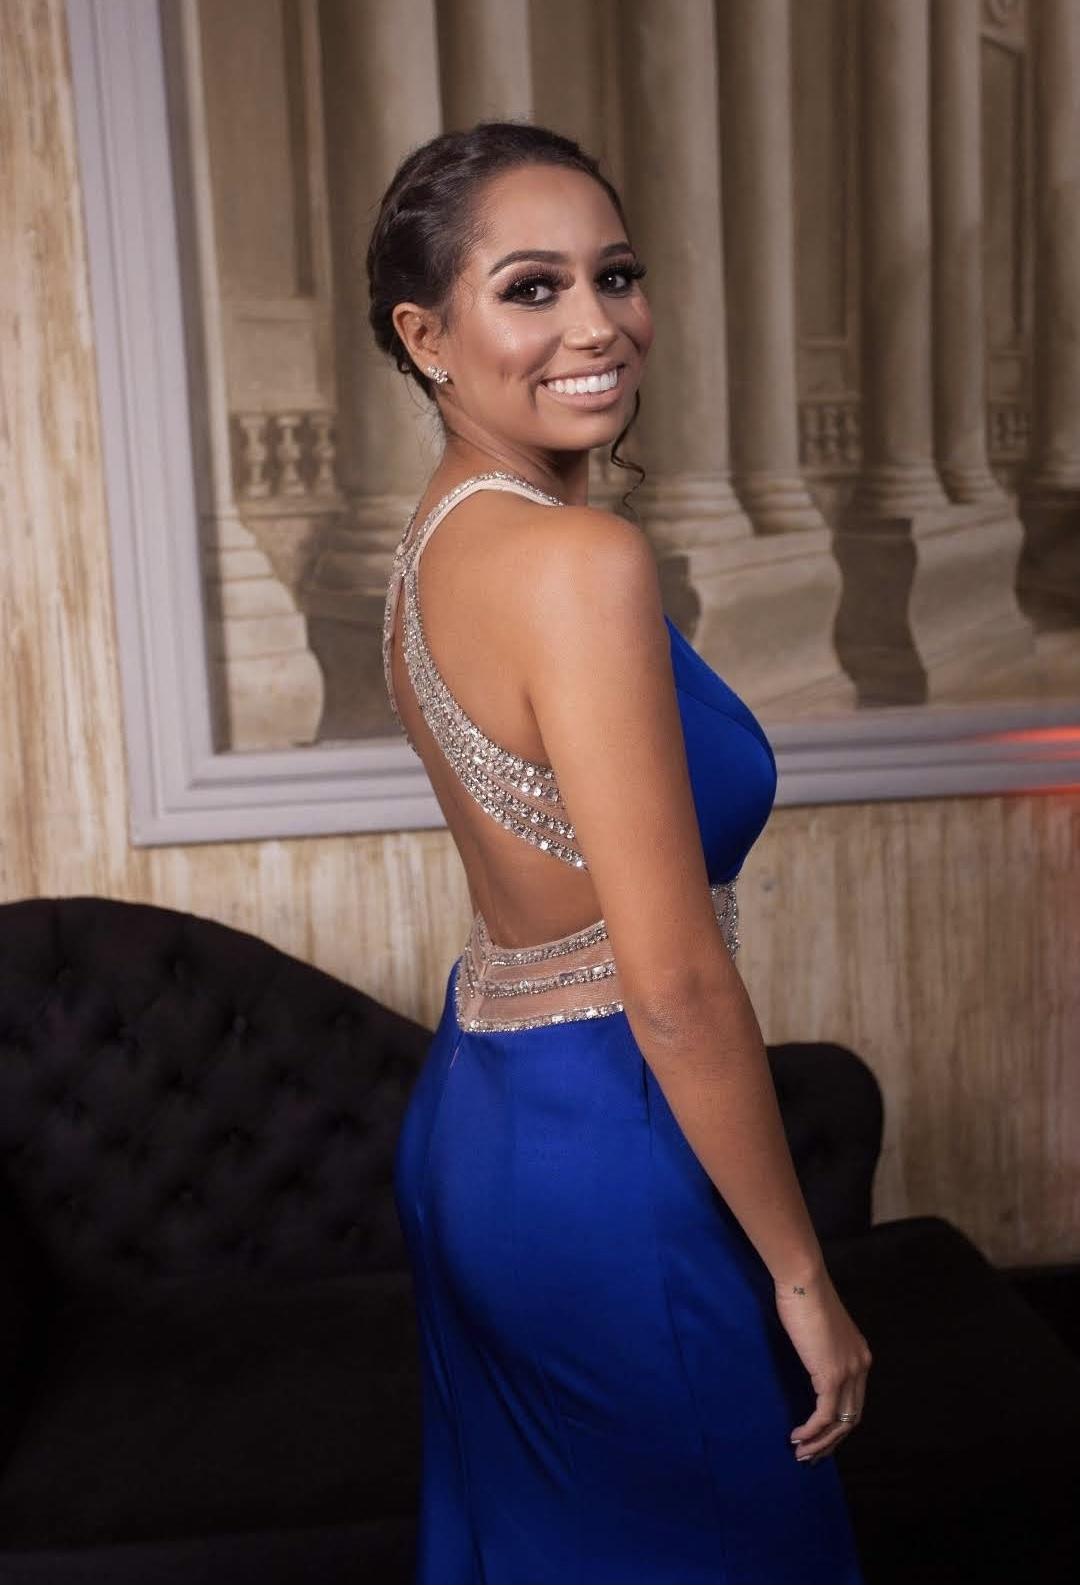 Vestido Azul Carolina